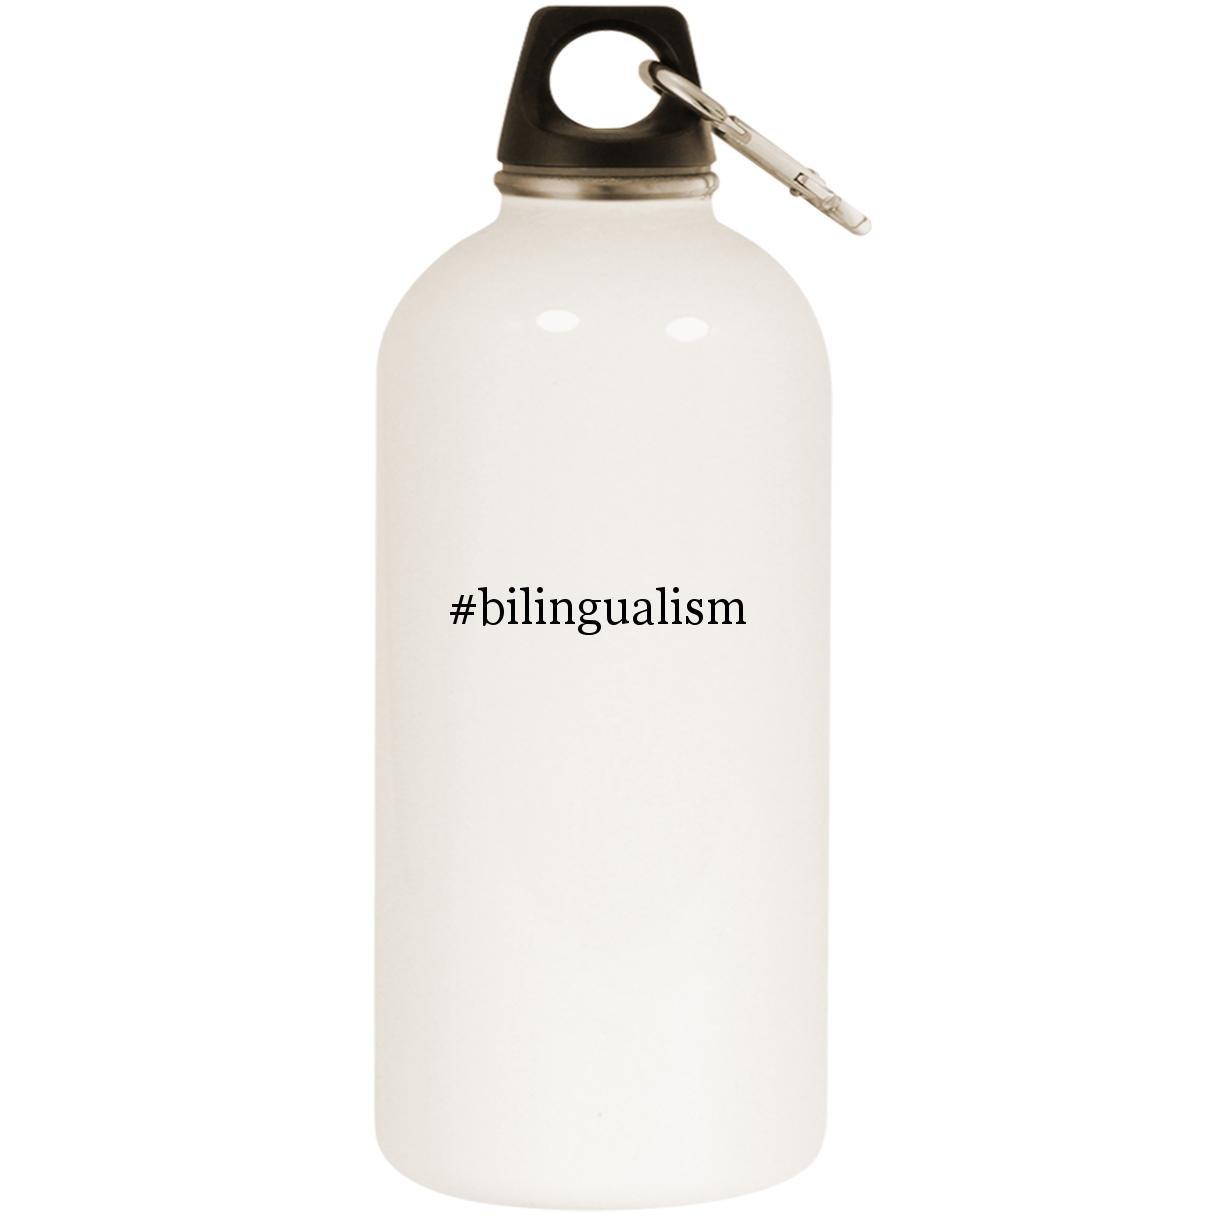 # Bilingualism – ホワイトハッシュタグ20ozステンレススチールウォーターボトルカラビナ B0741Z99YN